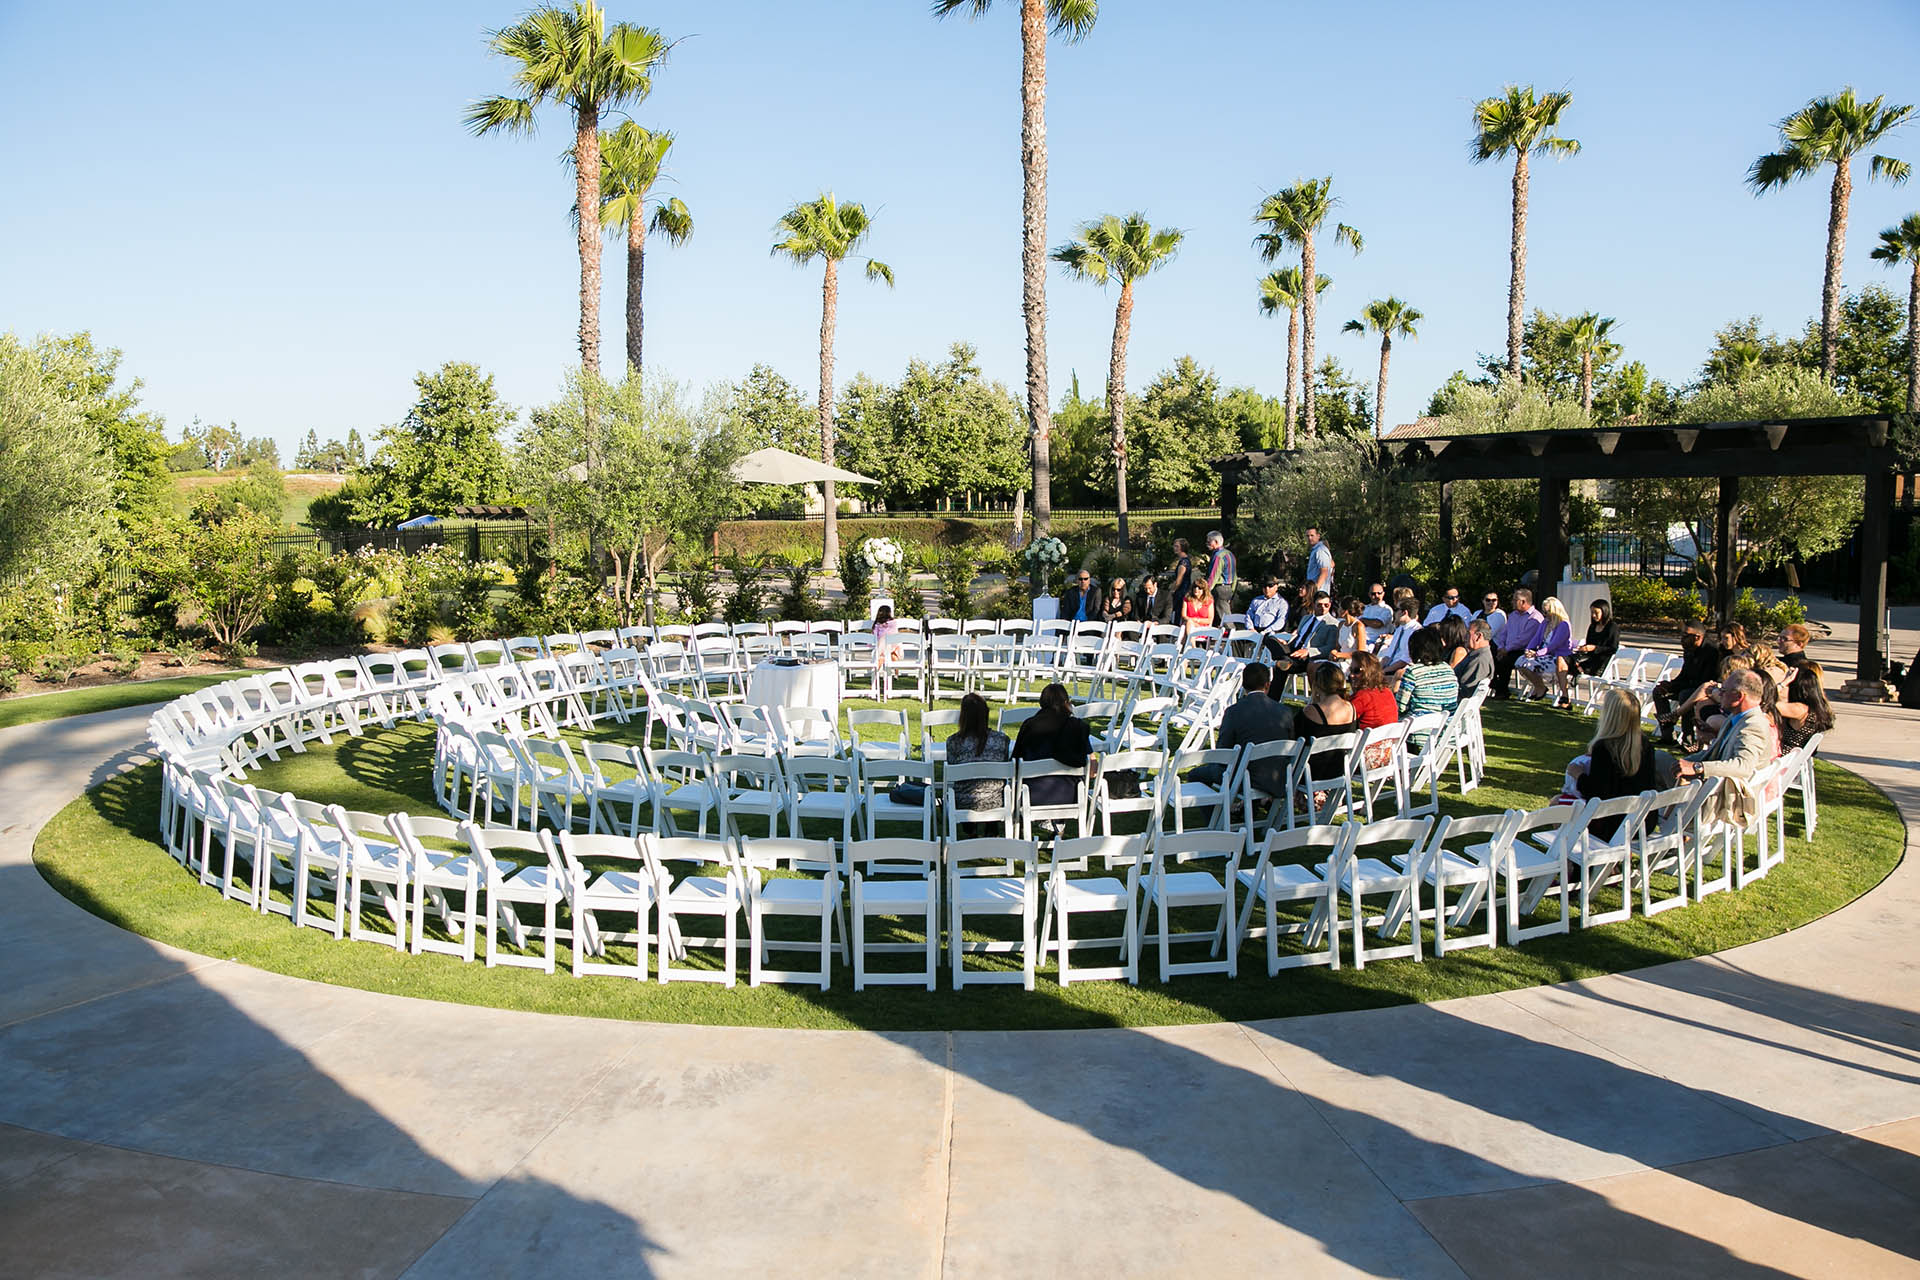 Aliso viejo wedgewood weddings orange county wedding ceremony wedgewood weddings aliso viejo junglespirit Images